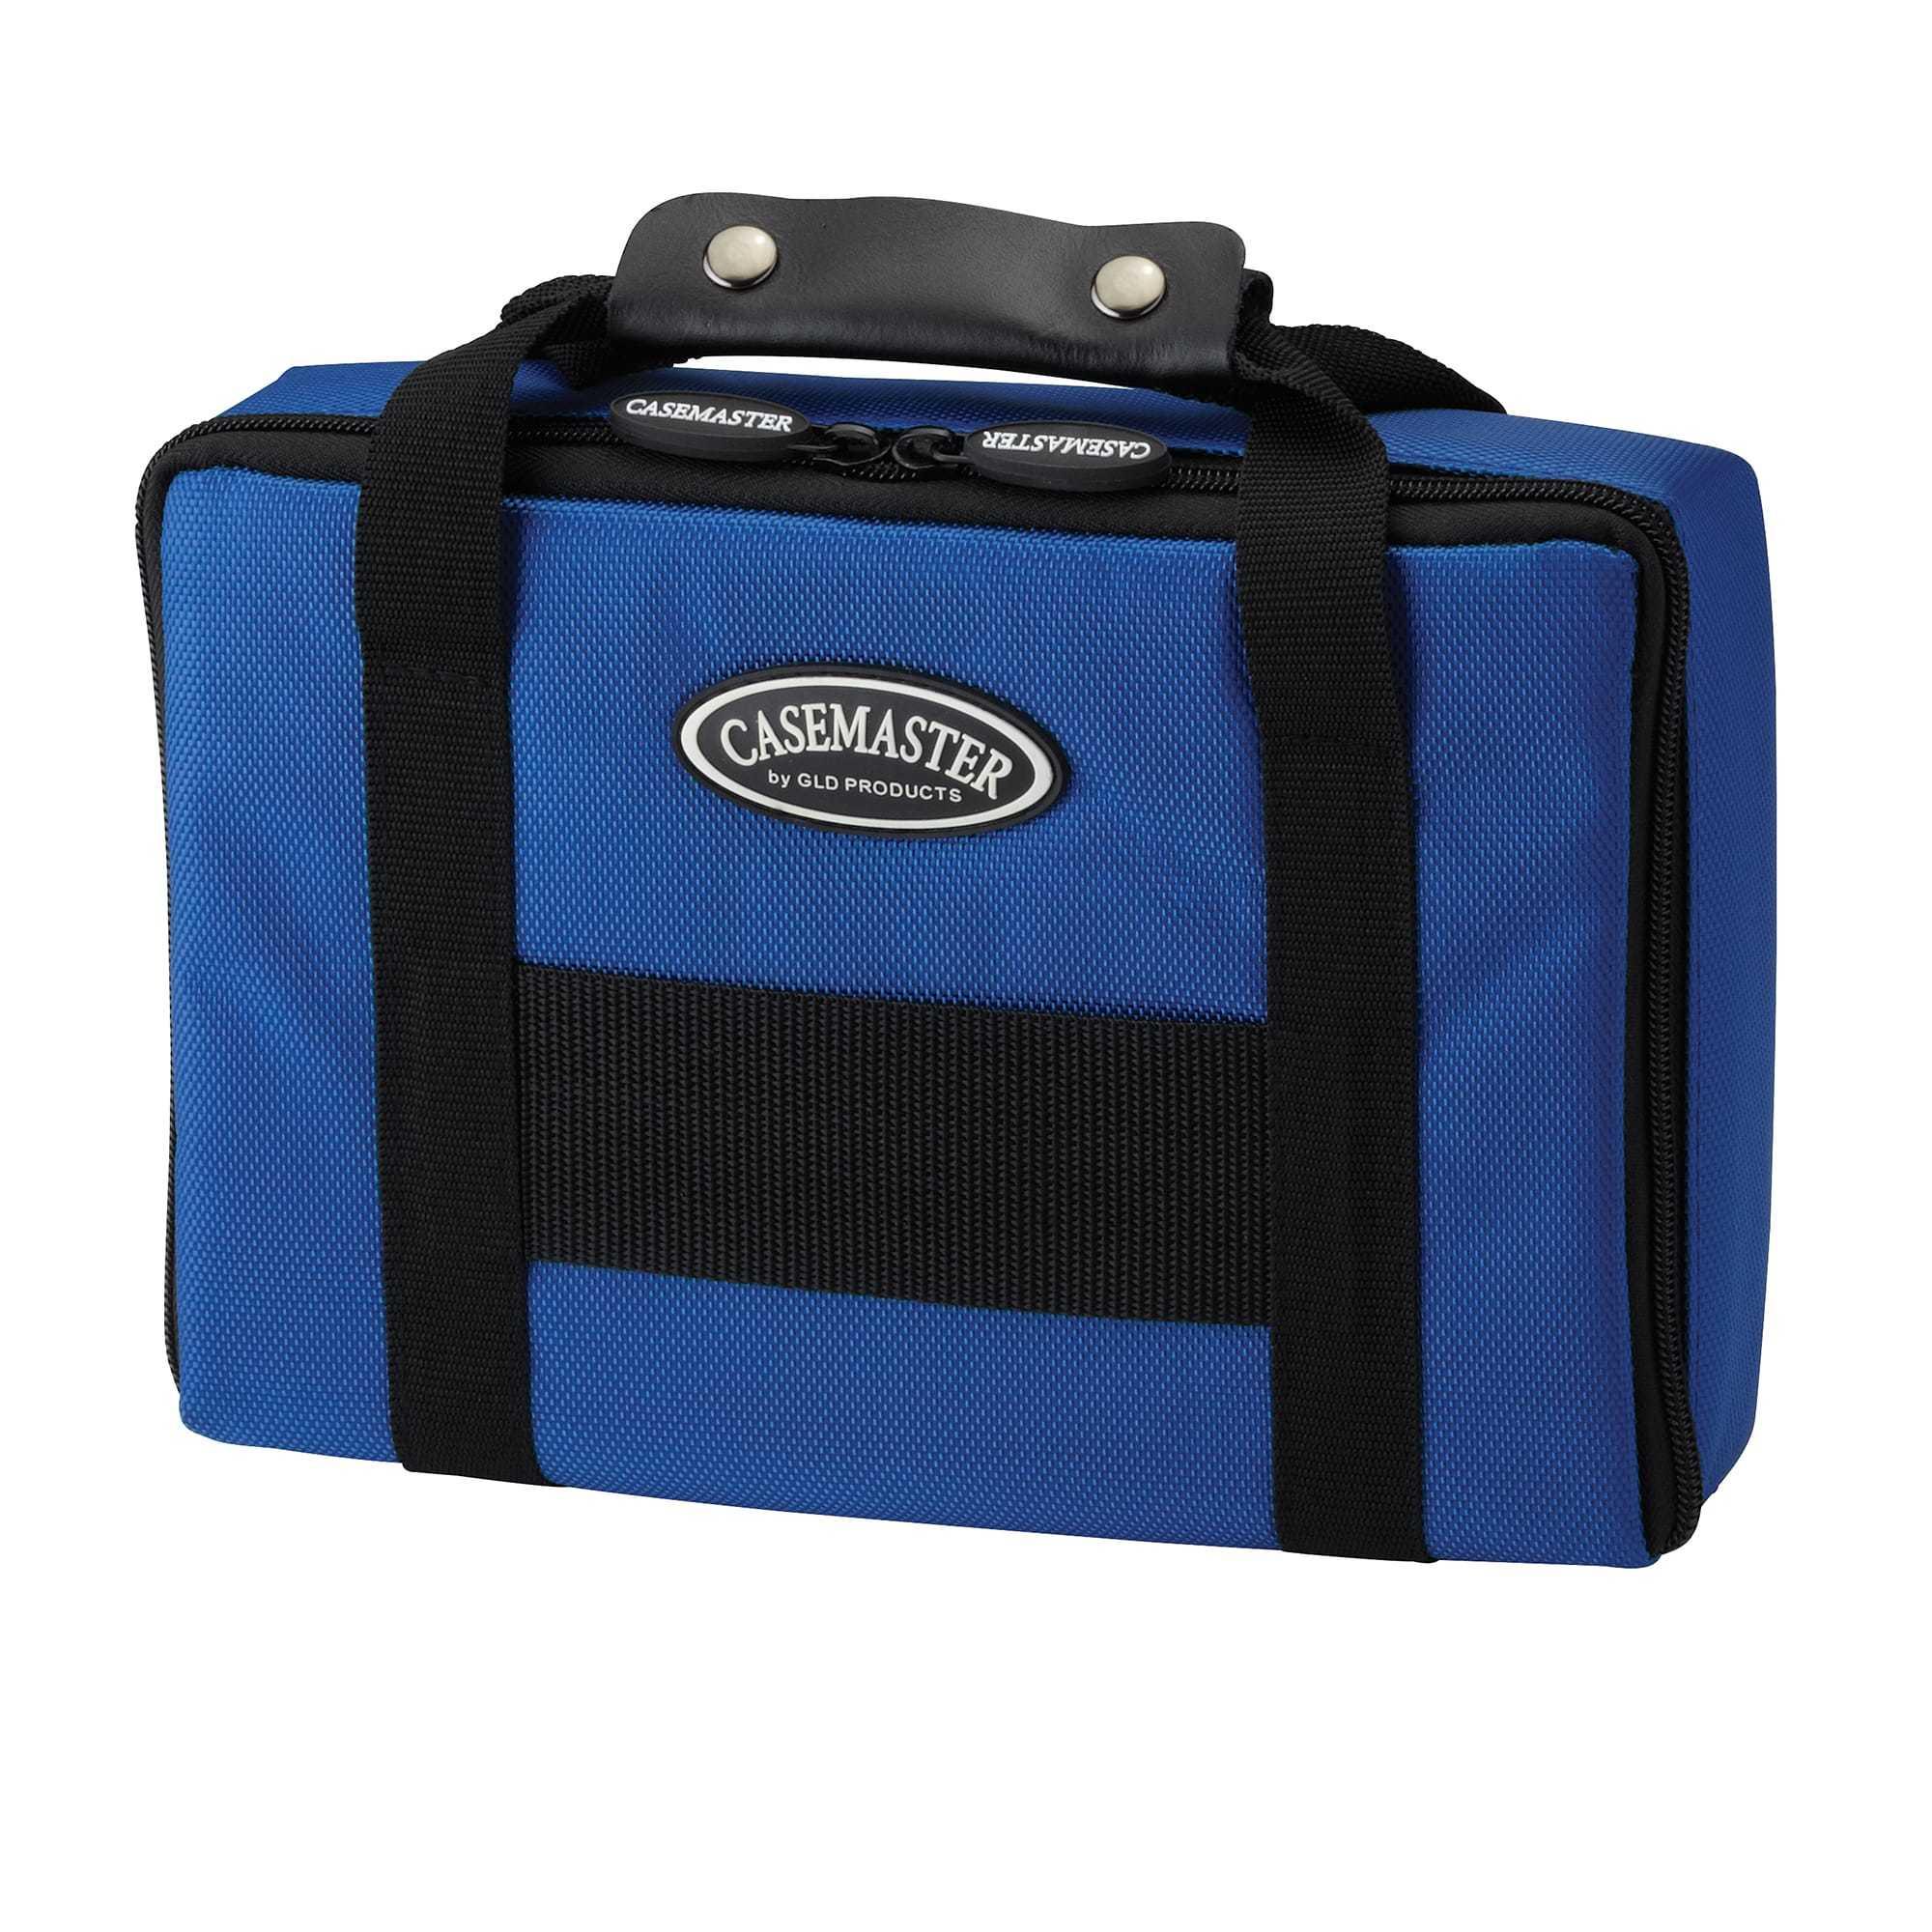 Casemaster Classic Blue Nylon Dart Case 2 Dart Sets | 36-0900-03 | moneymachines.com